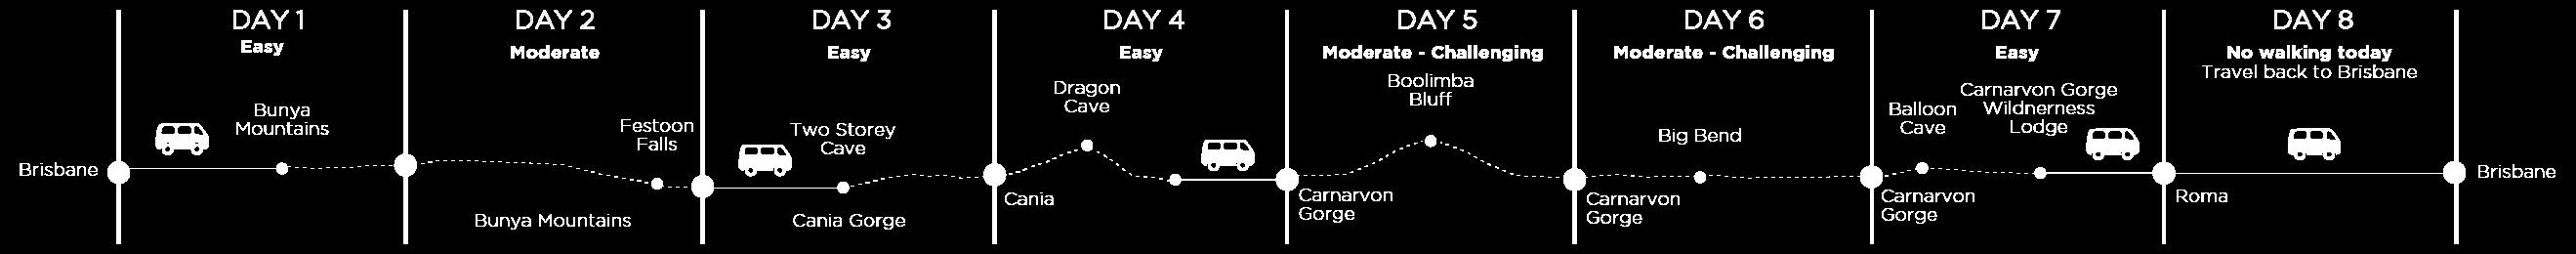 Carnarvon-Gorge-Group-Guided-Walking-Grading